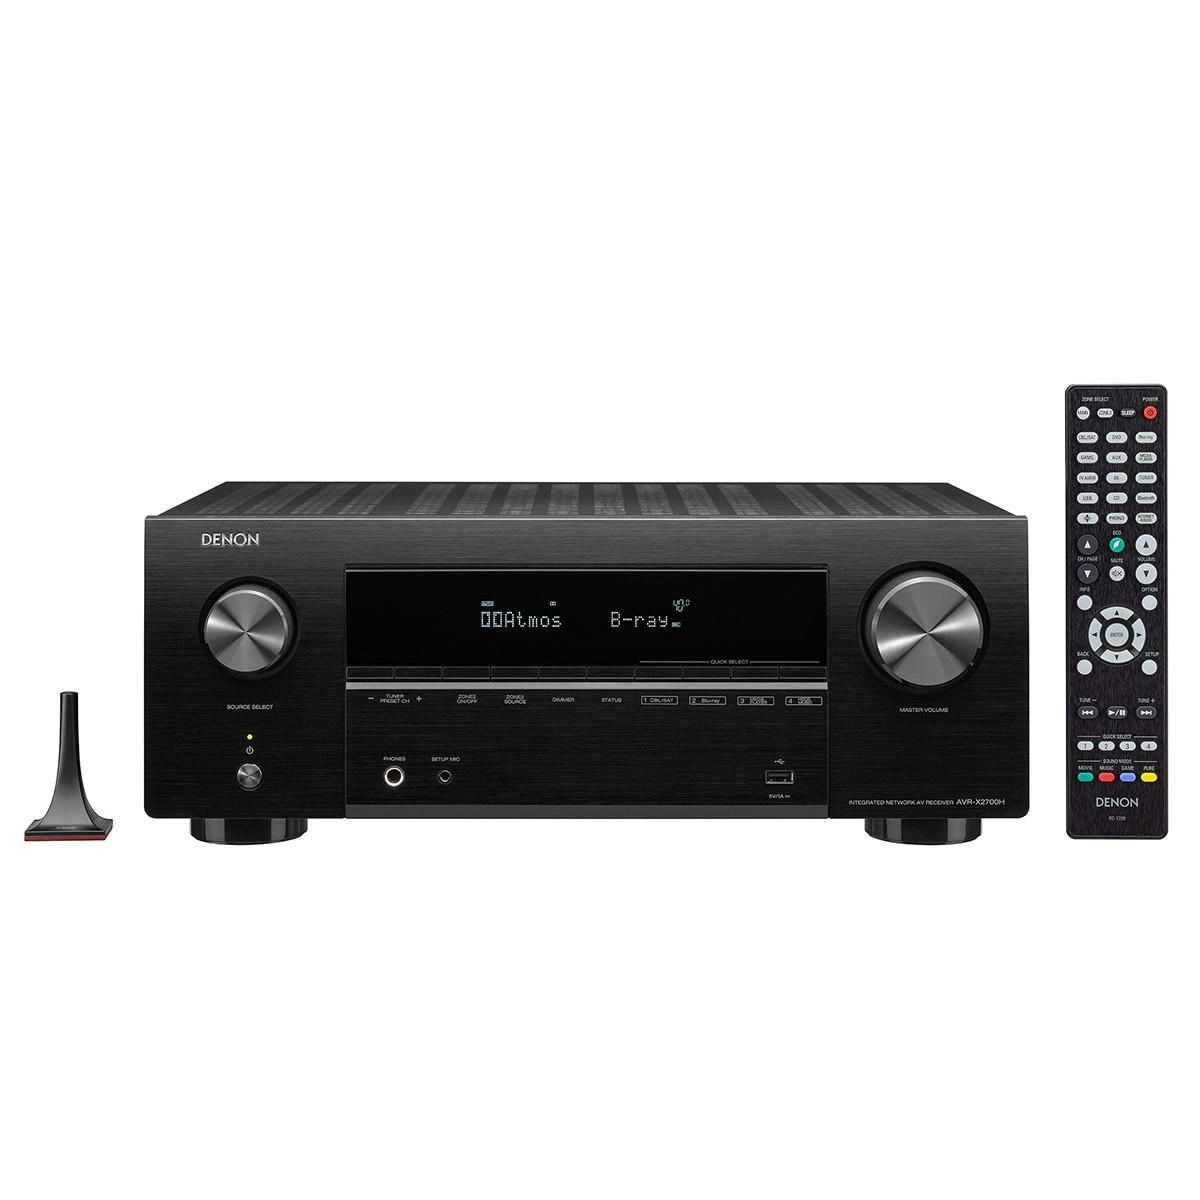 Házimozi rádióerősítő 7.2 HD AVR-X2700H